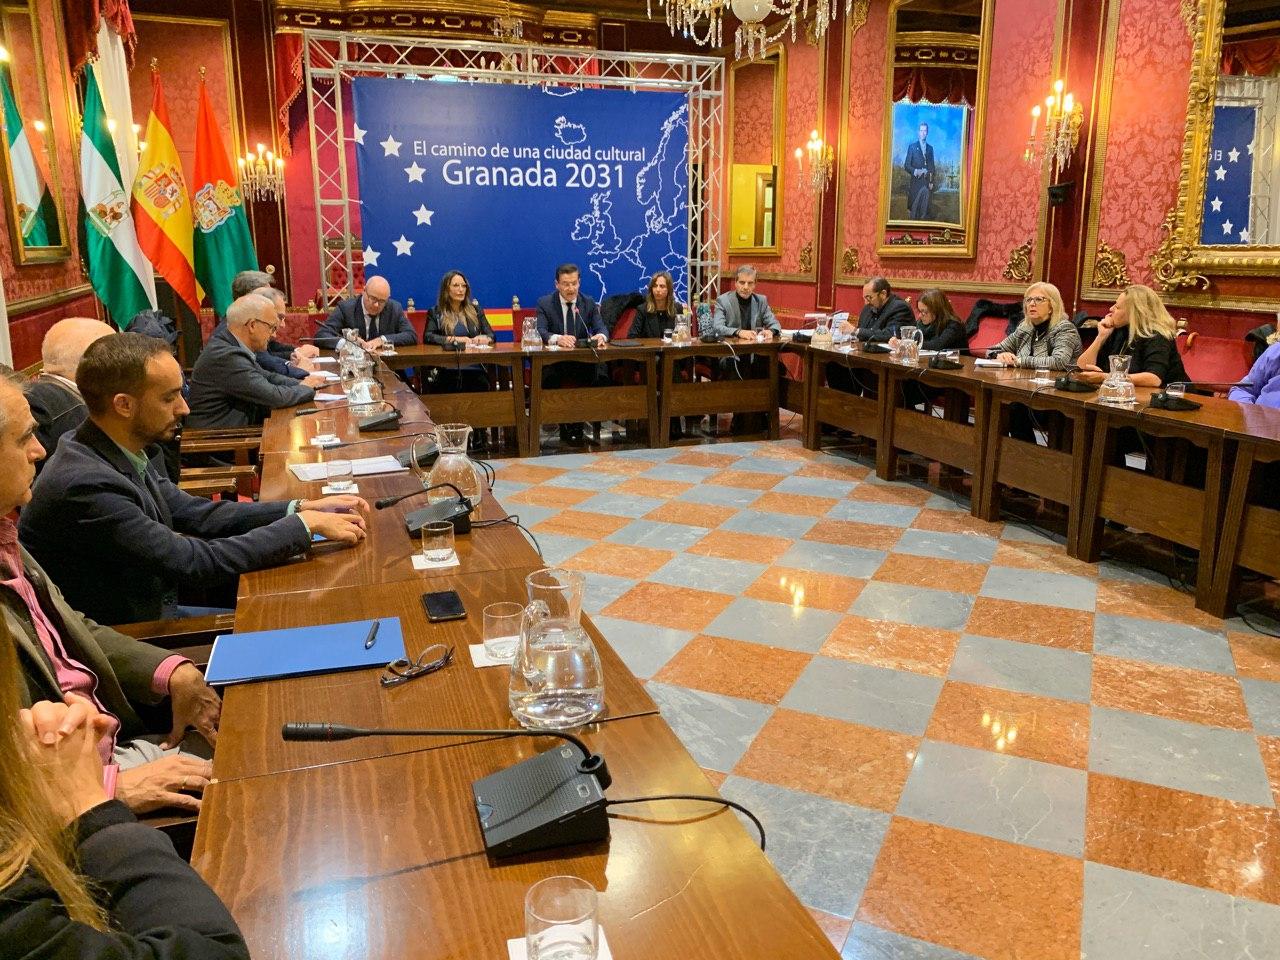 Granada da el primer paso del largo camino para ser Capital Cultural Europea 2031